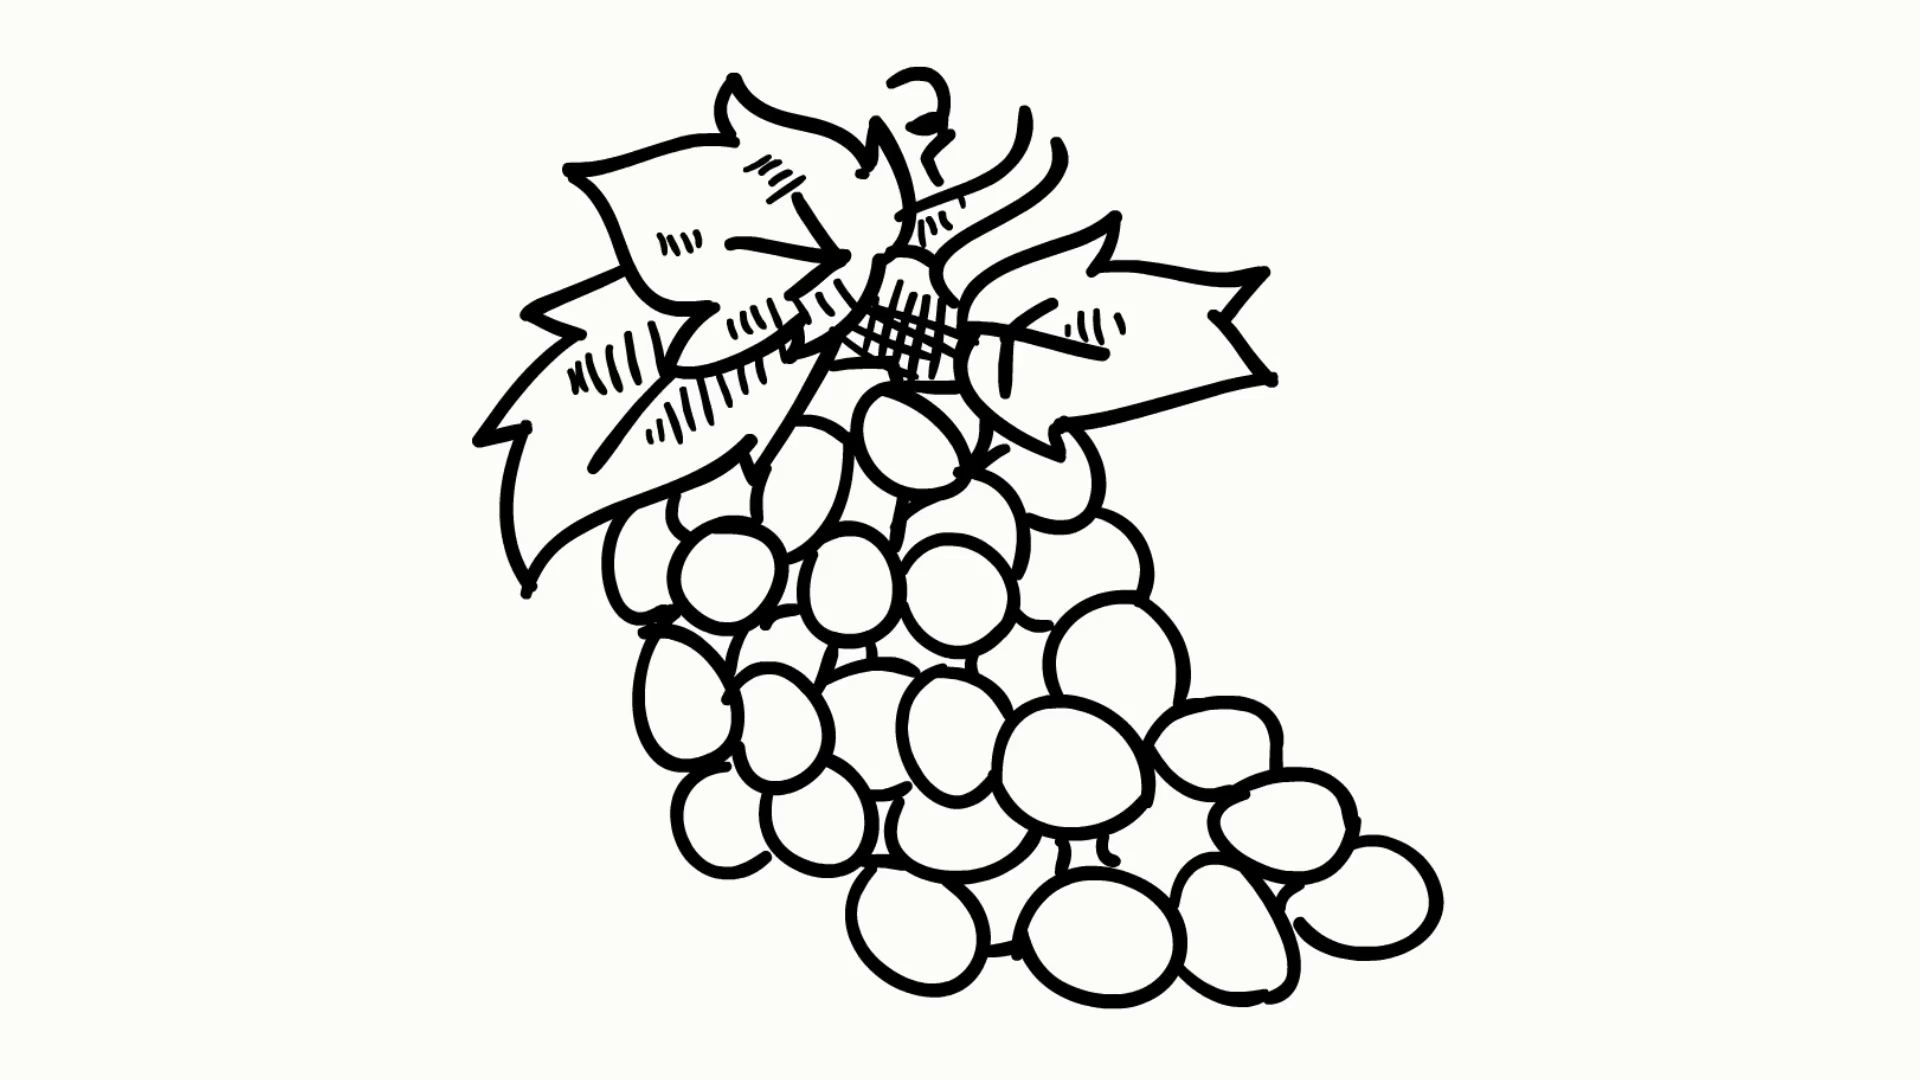 1920x1080 Tomato Fruit Vegetable Food Line Drawing Illustration Animation